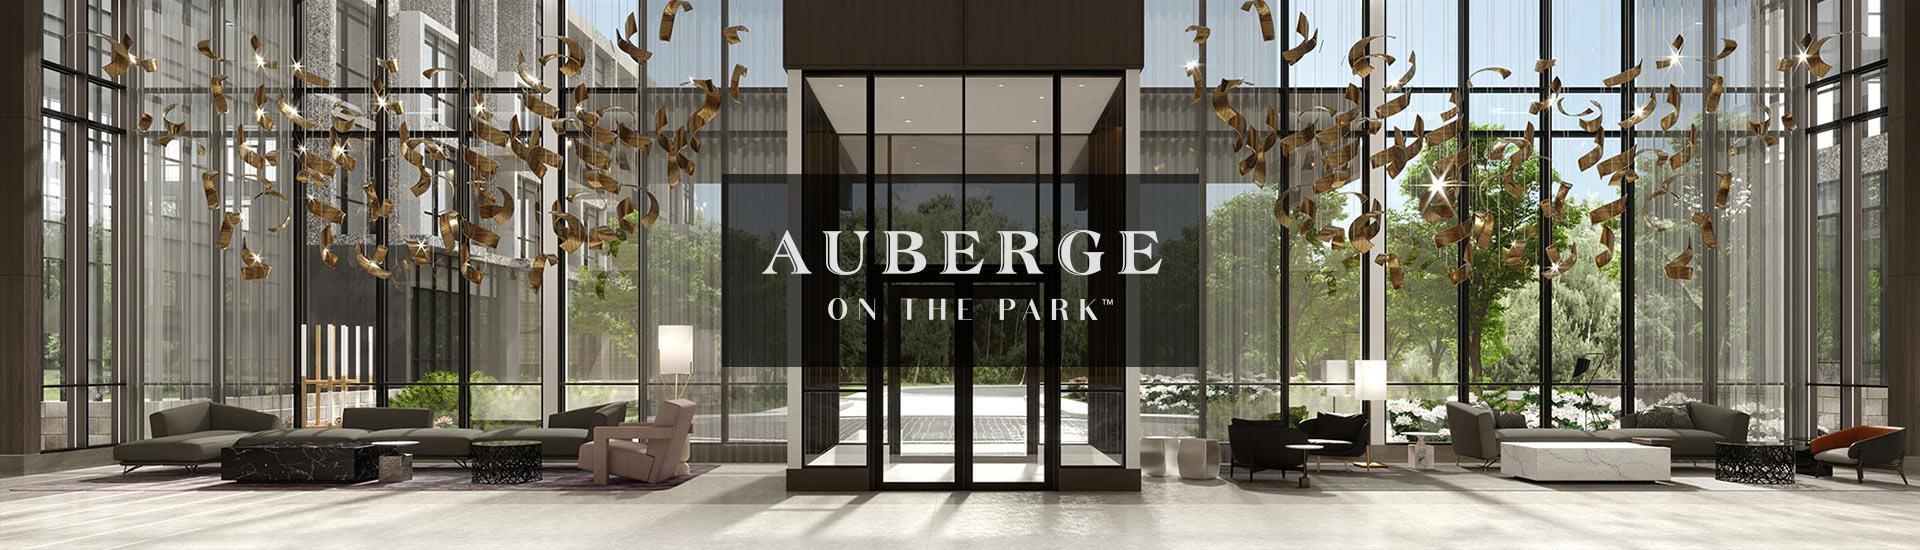 Auberge On The Park - Interior Lobby Render